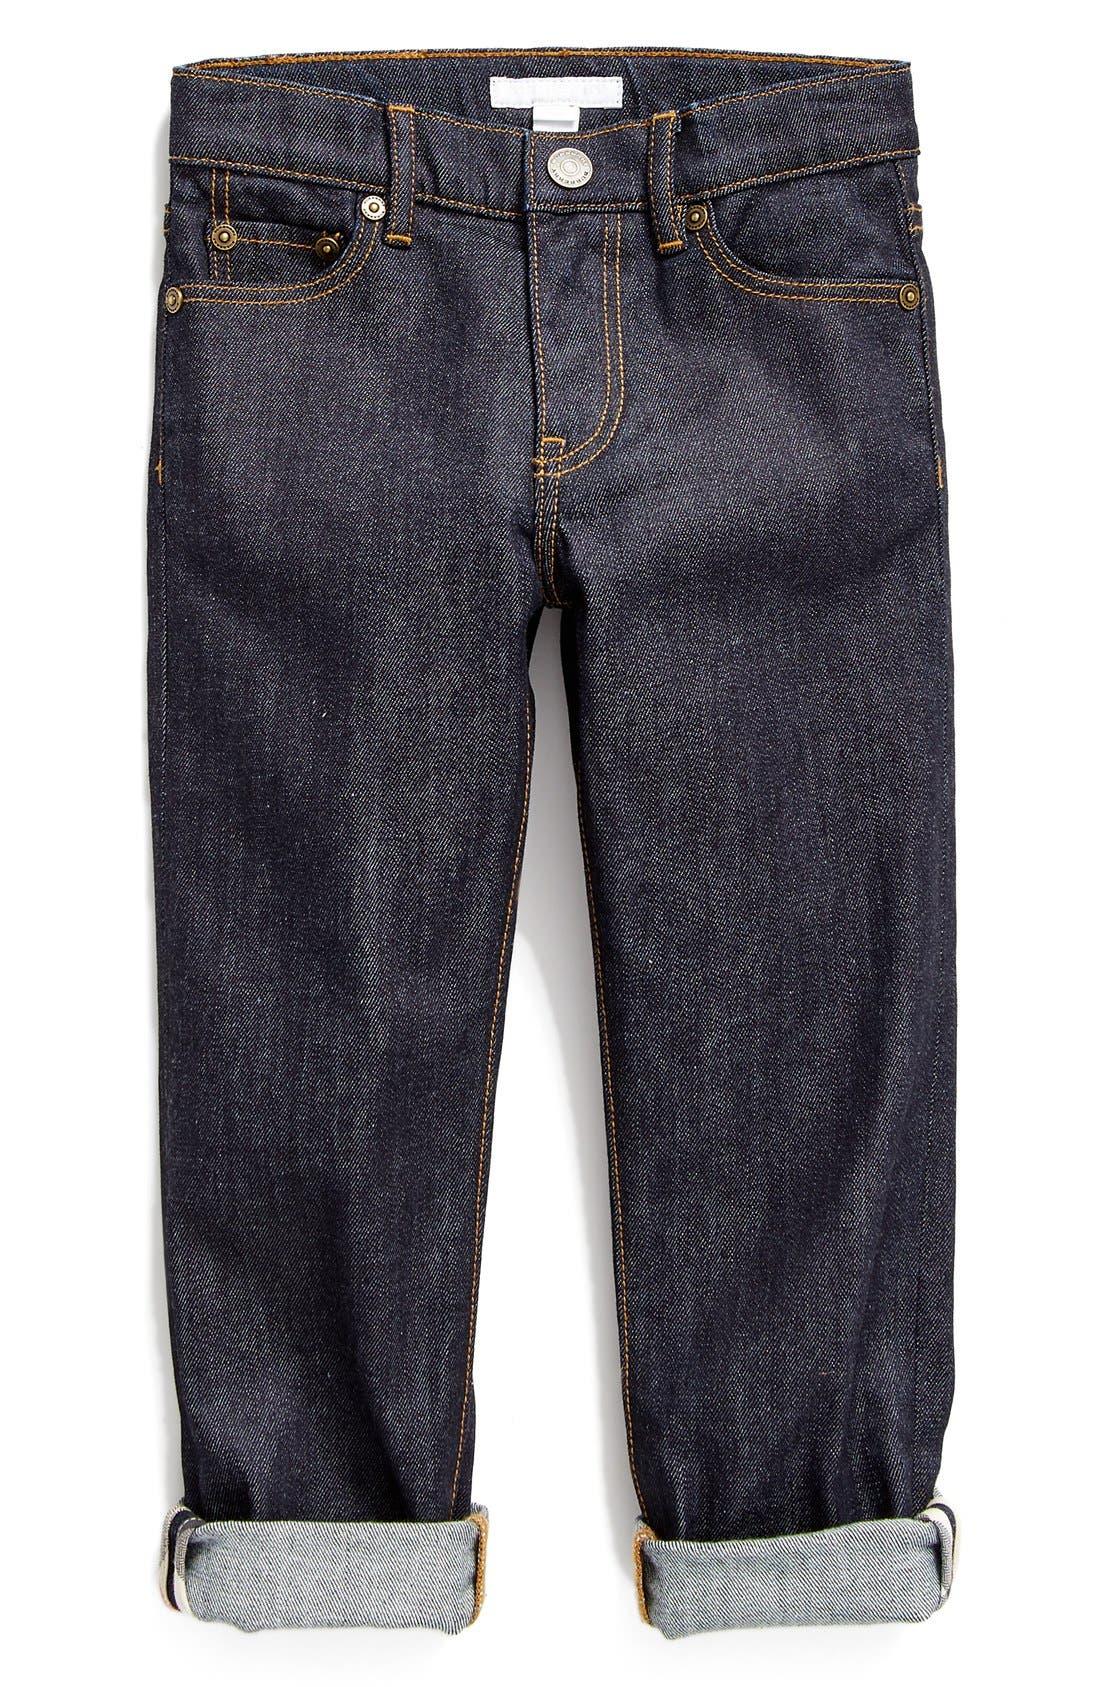 Main Image - Burberry Skinny Fit Jeans (Little Boys & Big Boys)